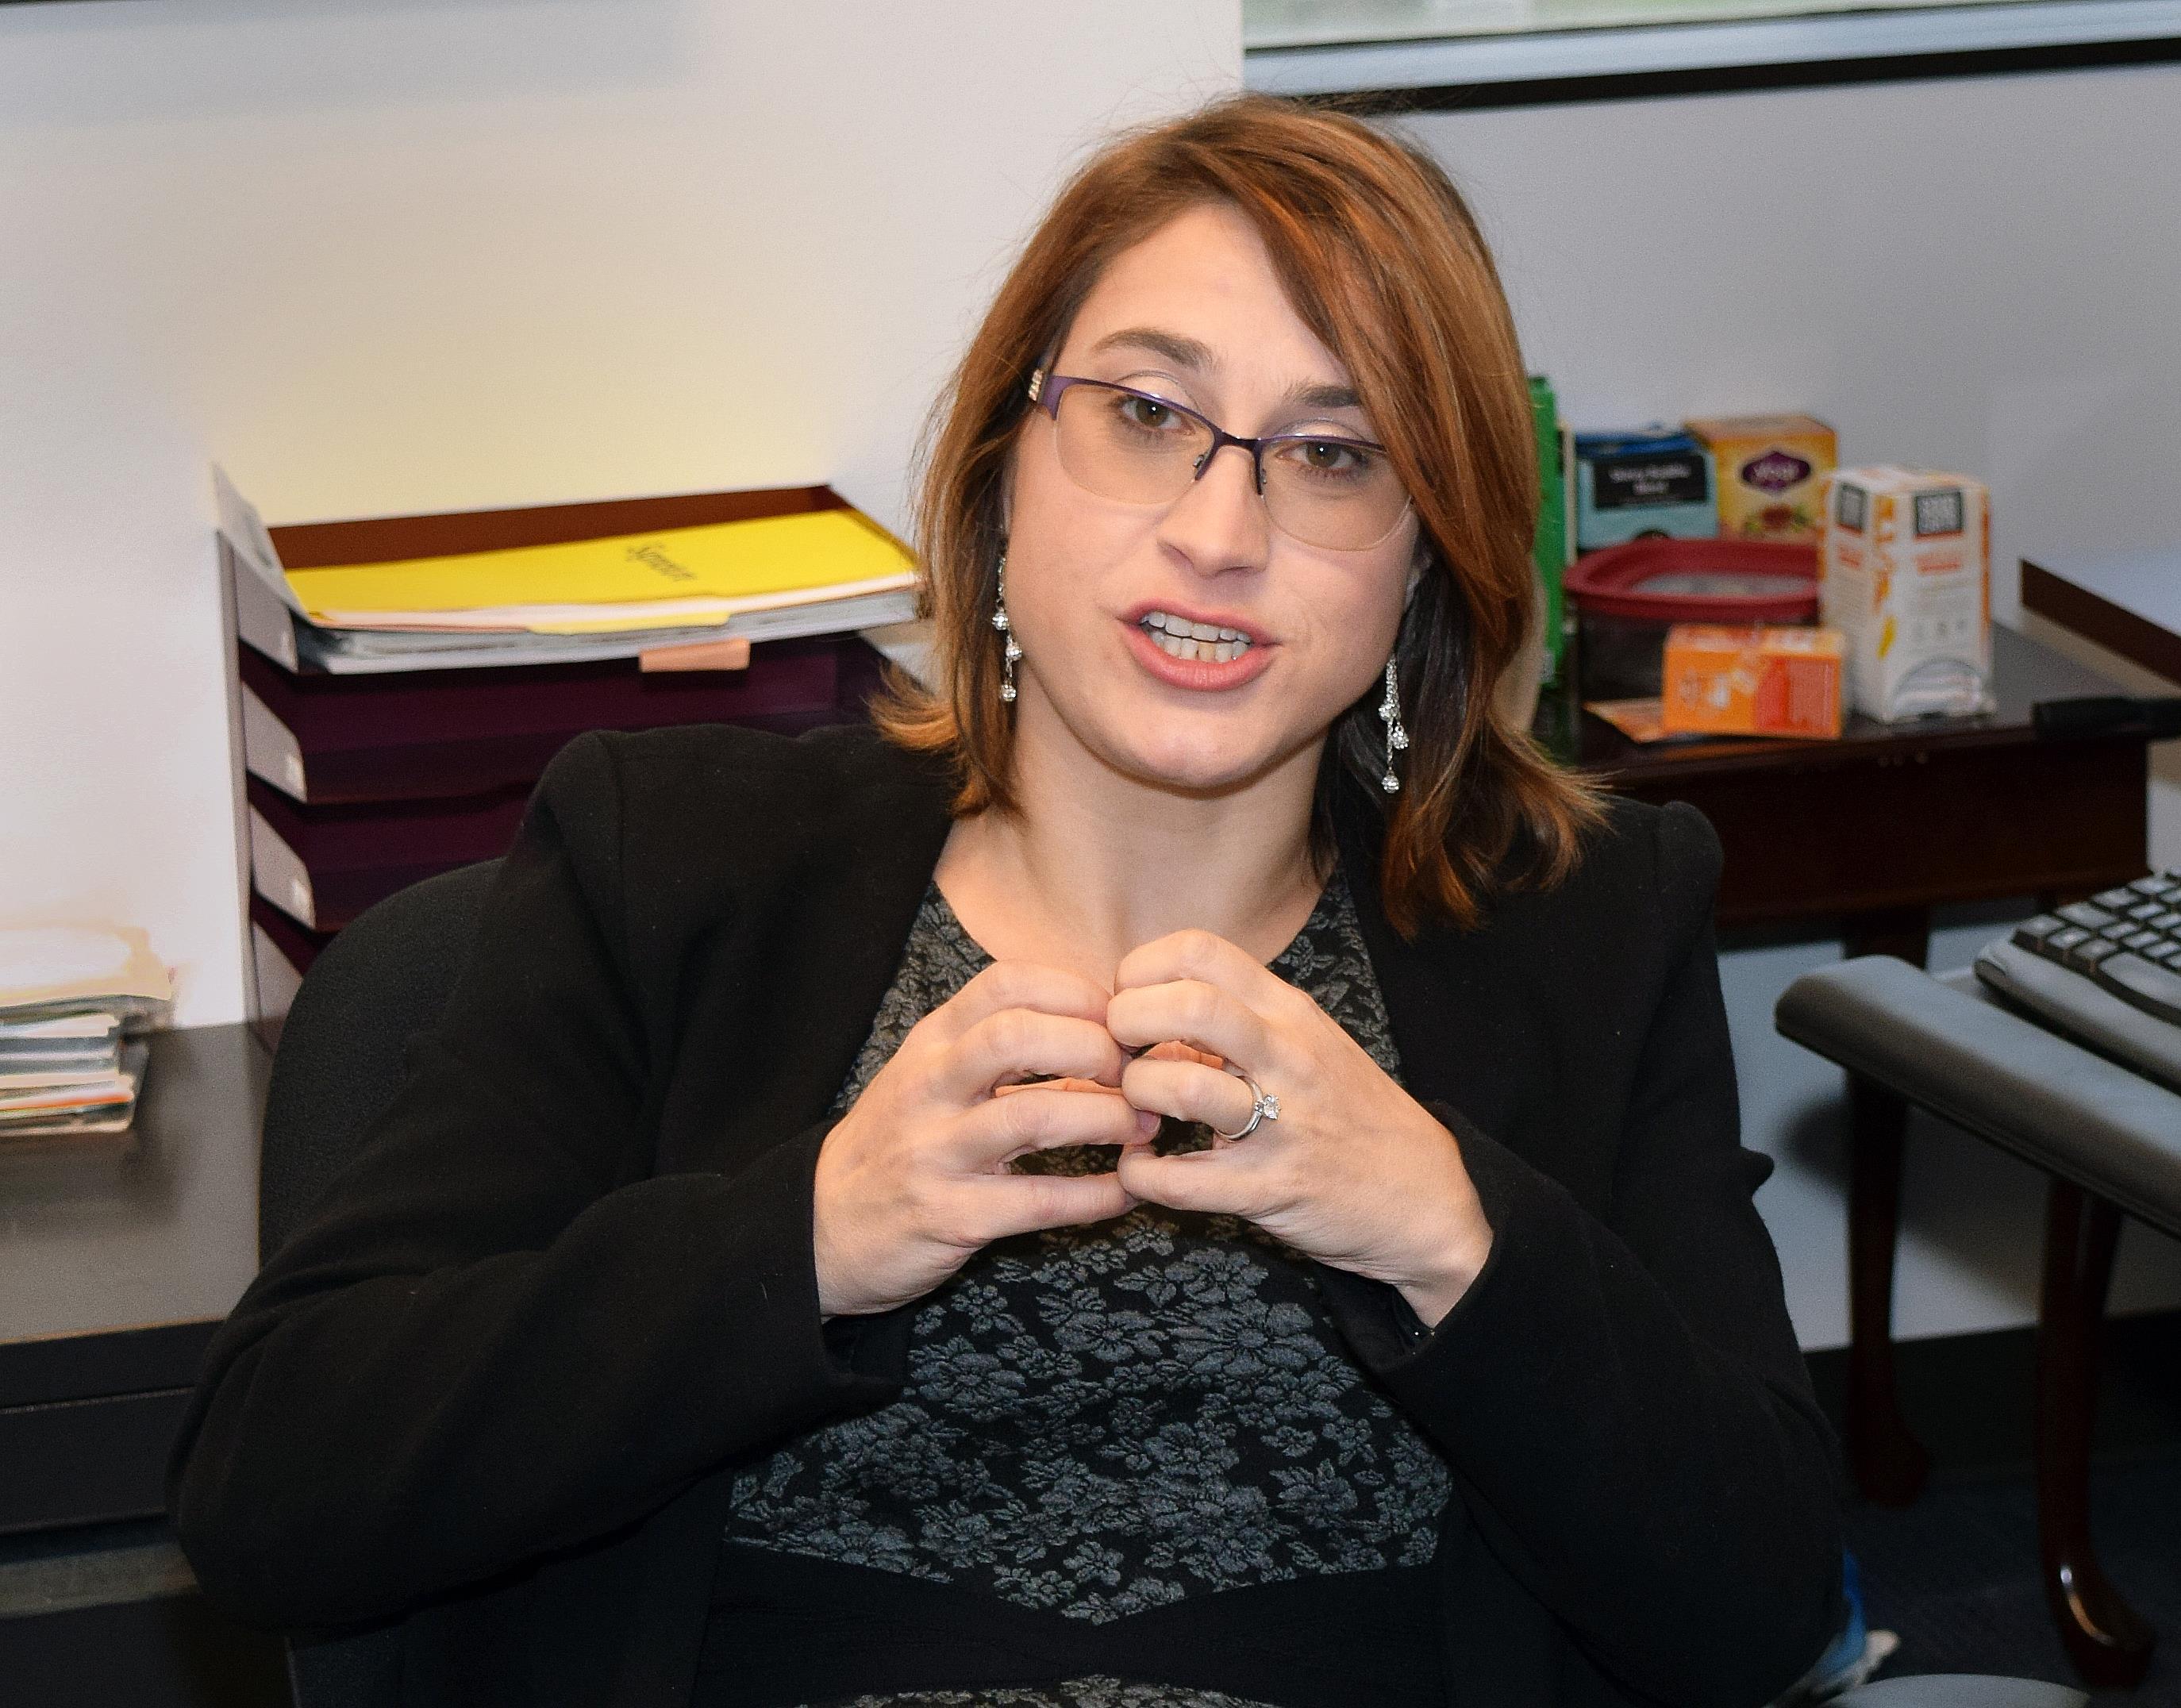 Amanda Fuller Pics amanda fuller: introspective, funny, genuine … lawyer